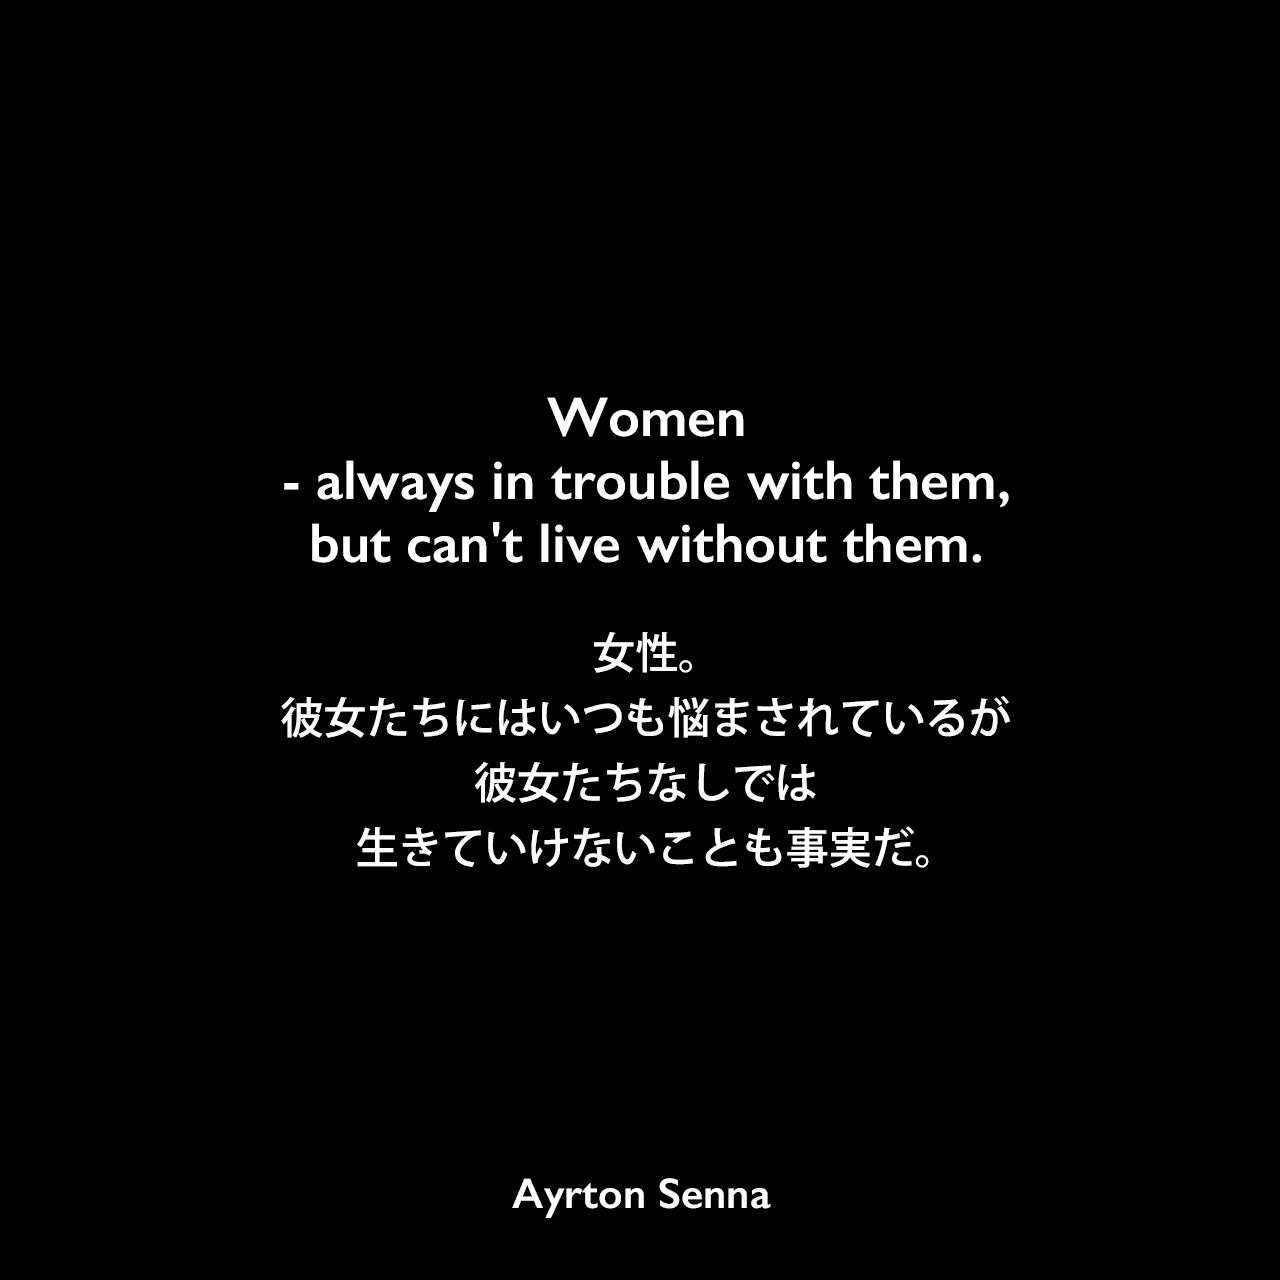 Women – always in trouble with them, but can't live without them.女性。彼女たちにはいつも悩まされているが、彼女たちなしでは生きていけないことも事実だ。